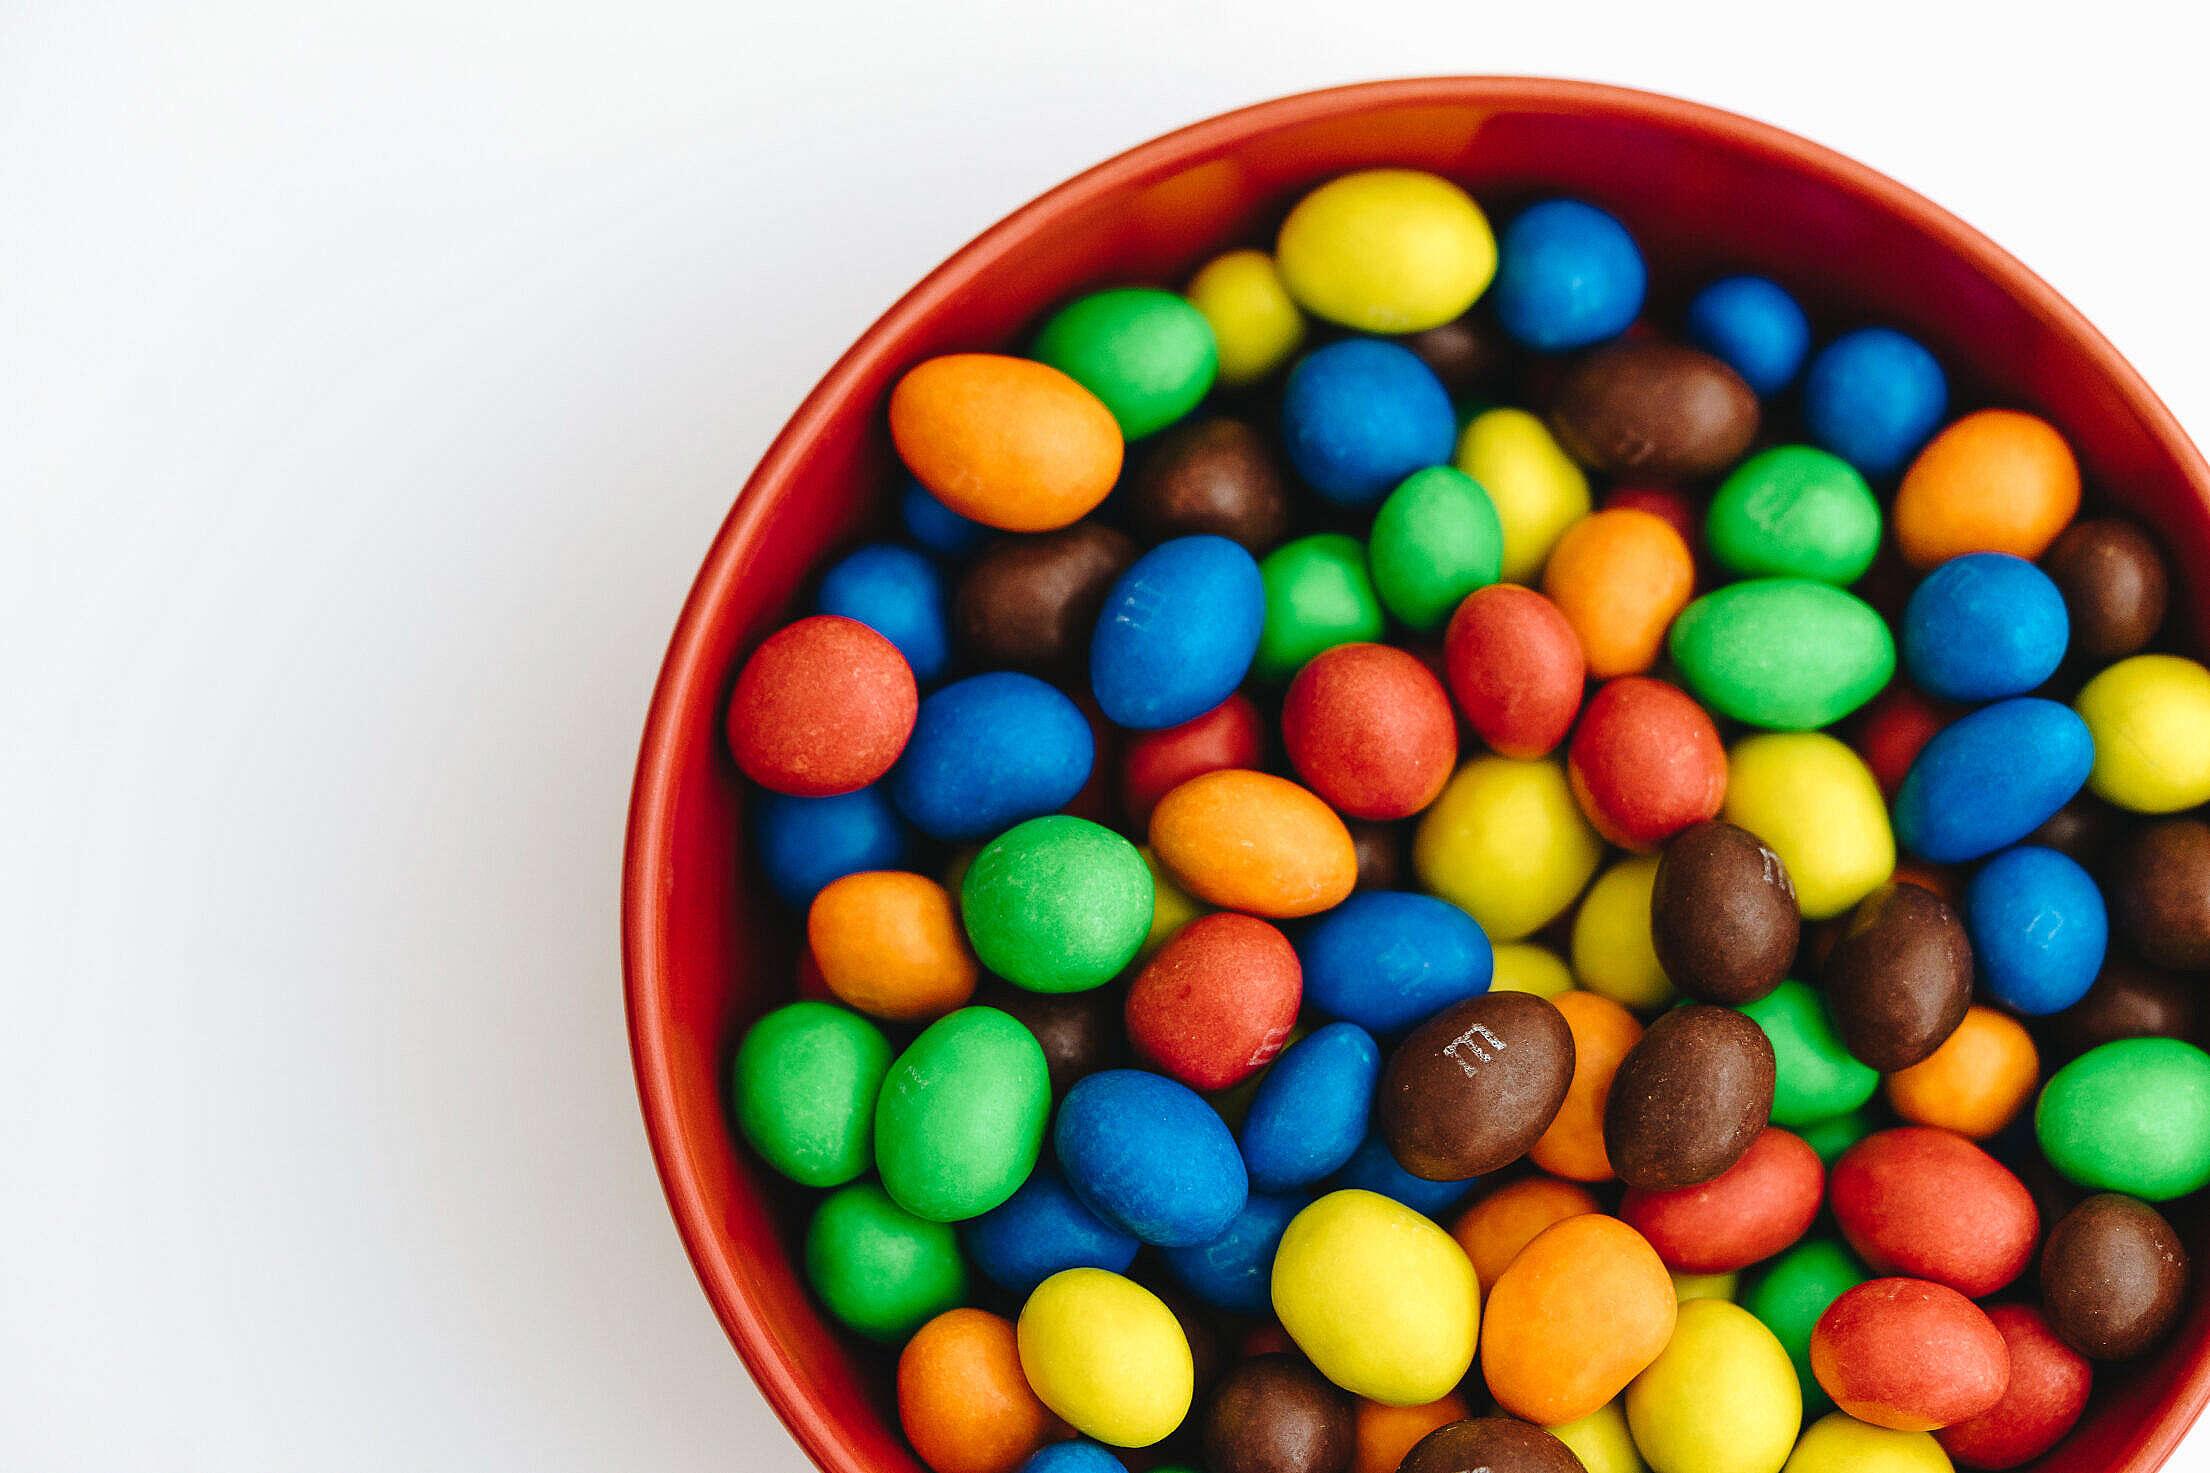 M&M's Peanut Chocolates Free Stock Photo